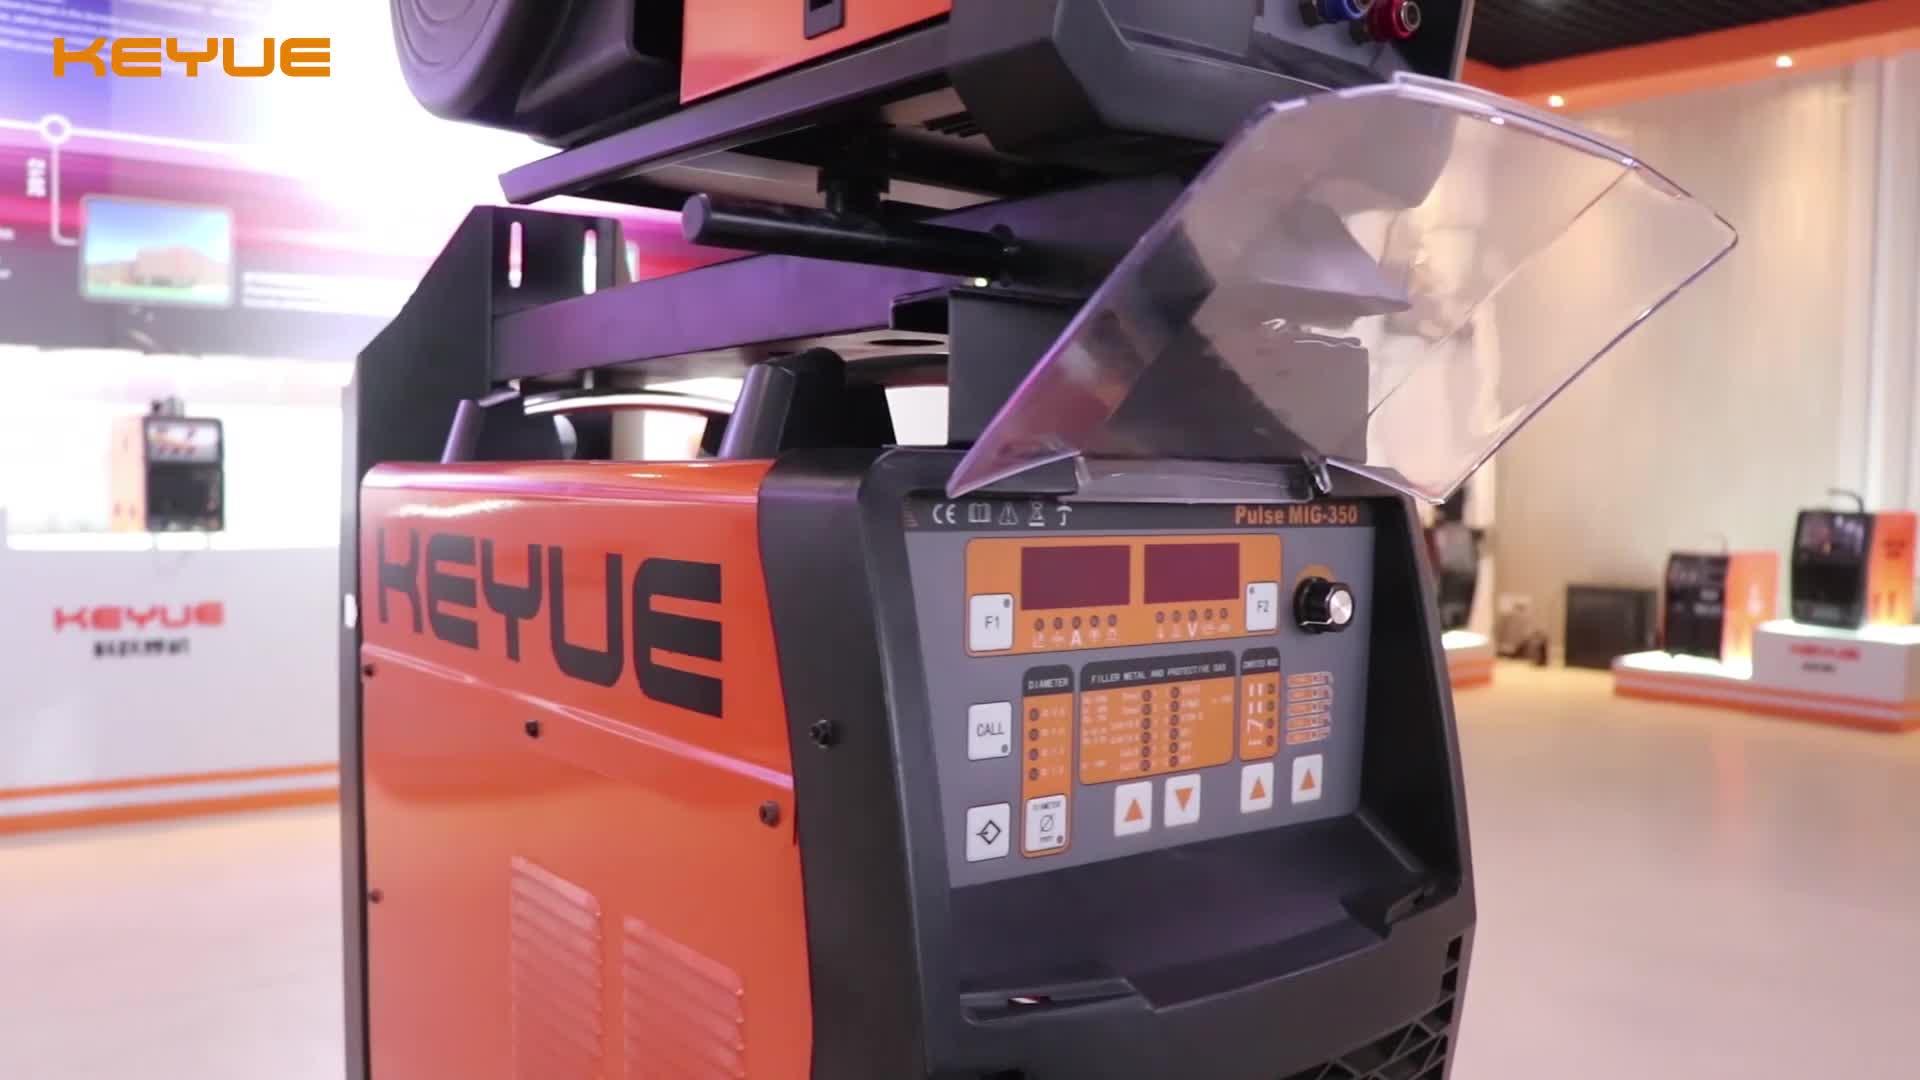 IGBT DC Inverter trifase ad alta frequenza heavy duty digital Synergic gas CO2 TIG/SMAW/mig/mag twin pulse alluminio Saldatore